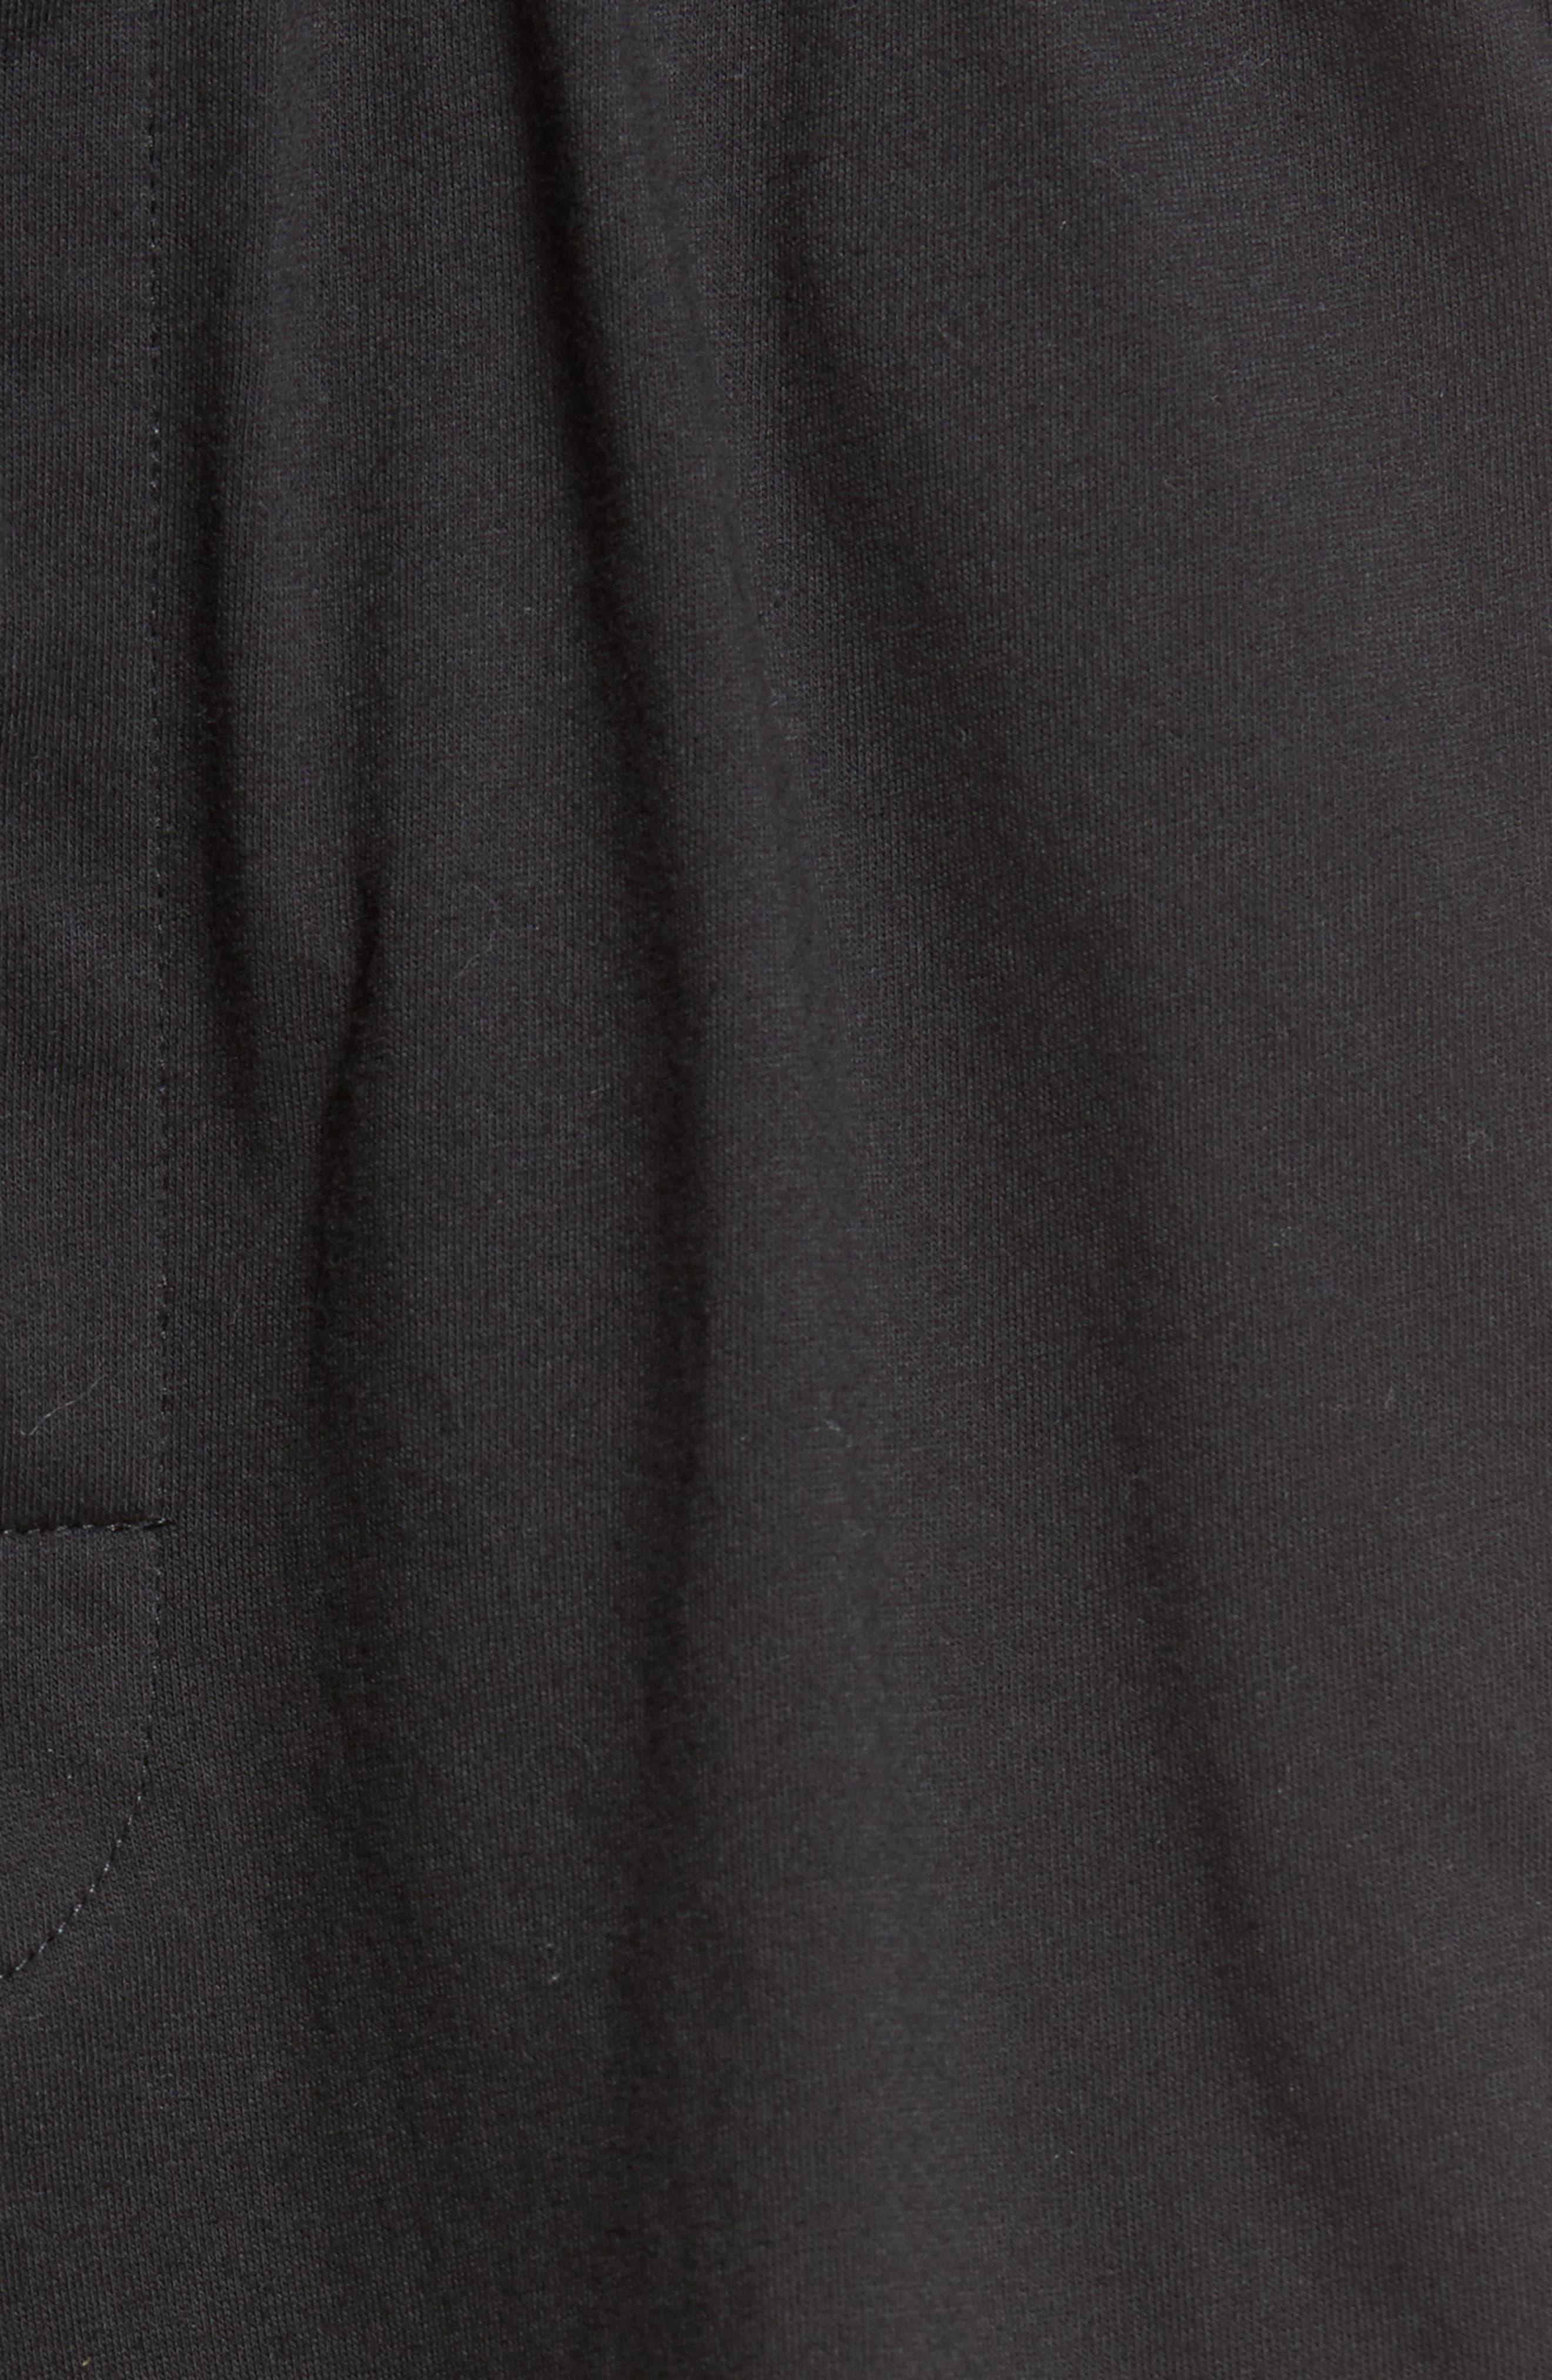 Cotton Lounge Shorts,                             Alternate thumbnail 5, color,                             Solid Black